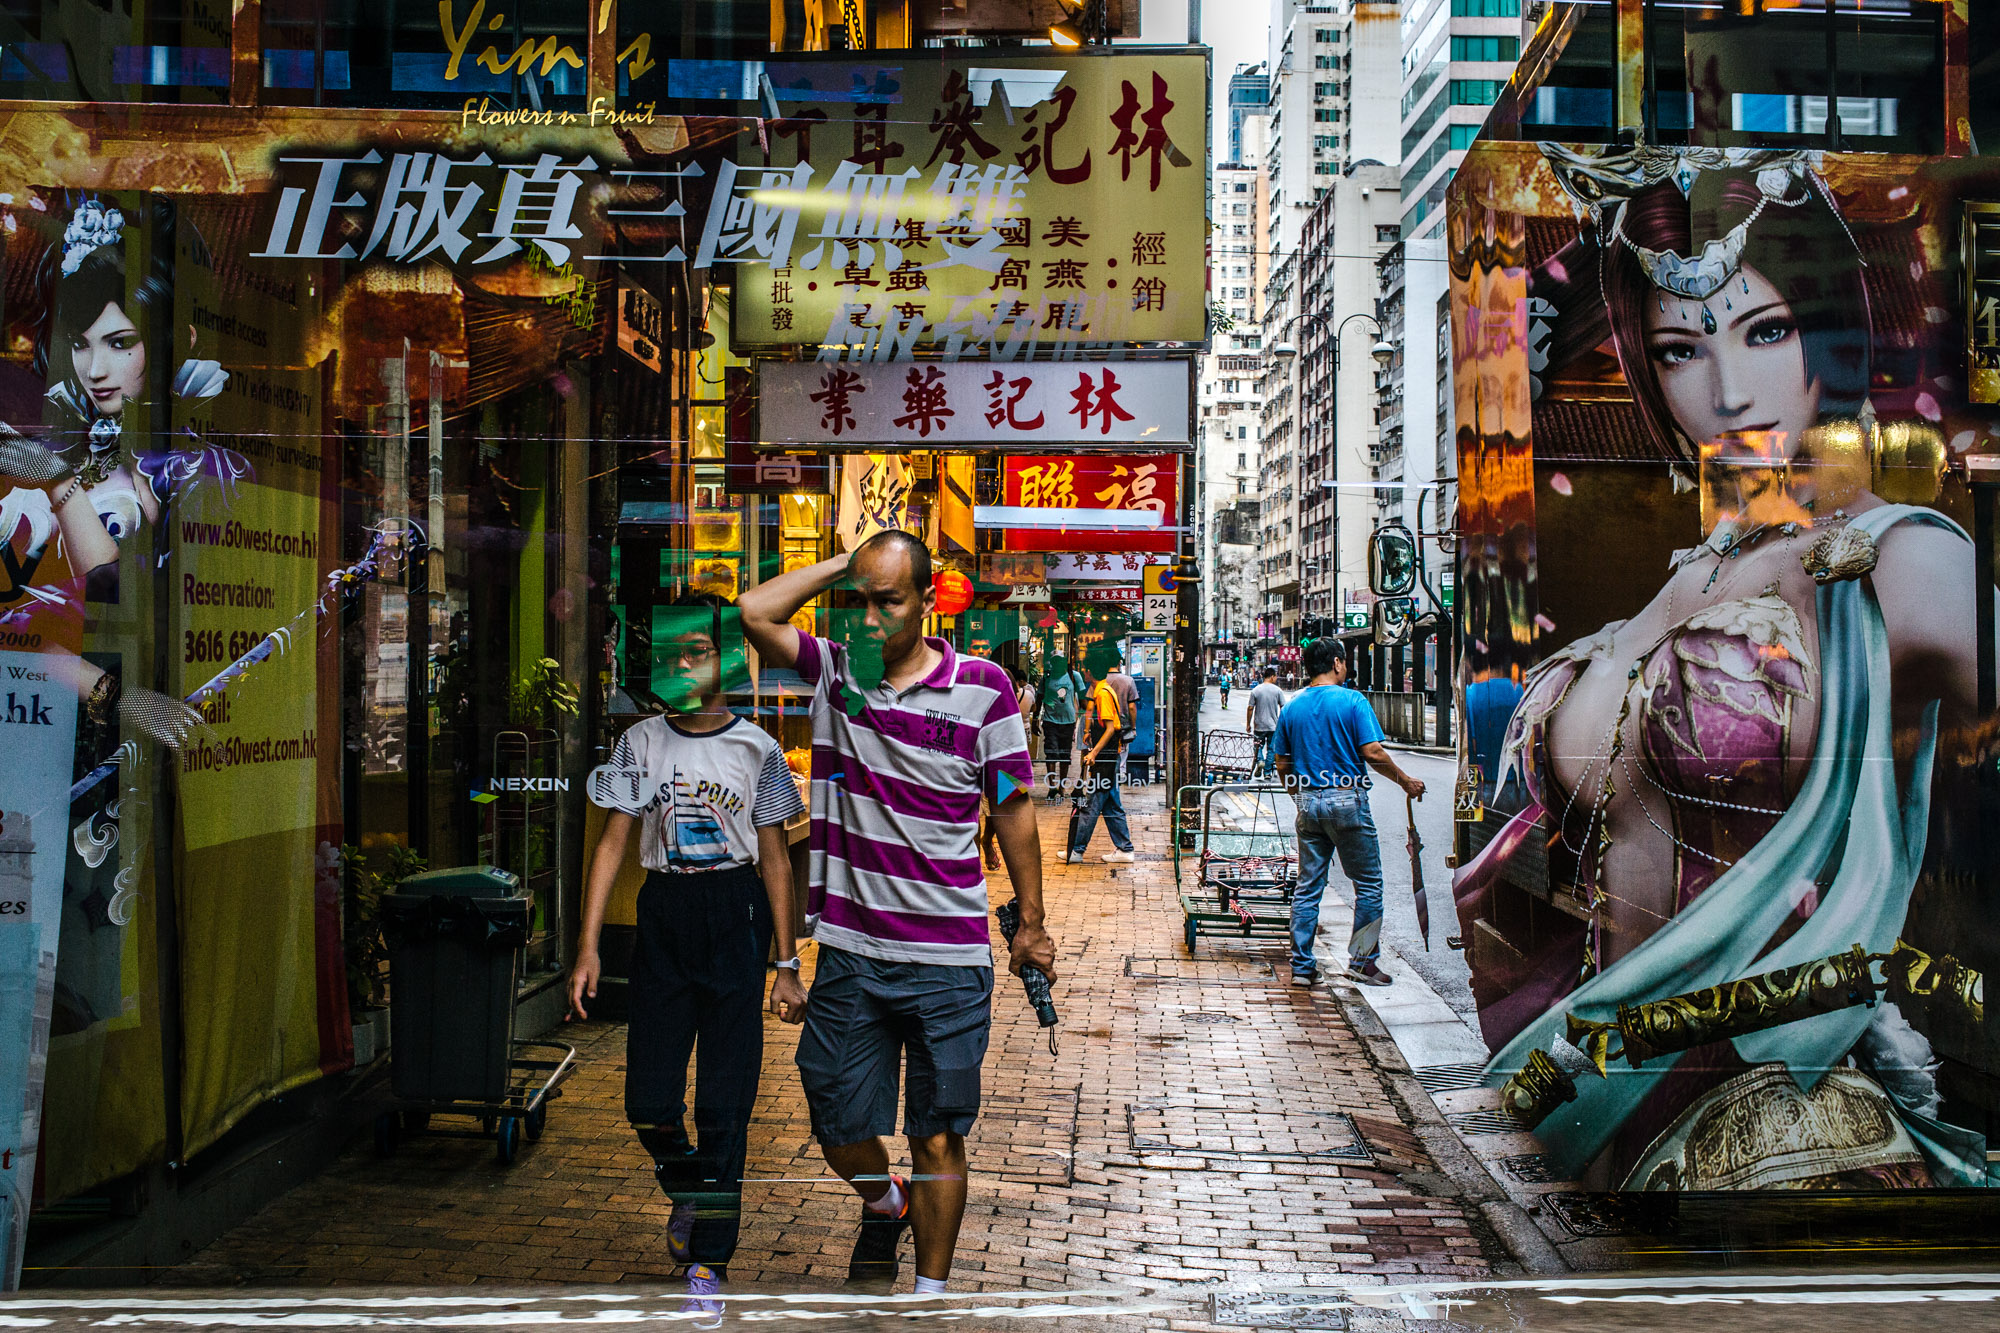 Ellen_Friedlander_Hong Kong Multiple Exposure_2017 -0061.jpg